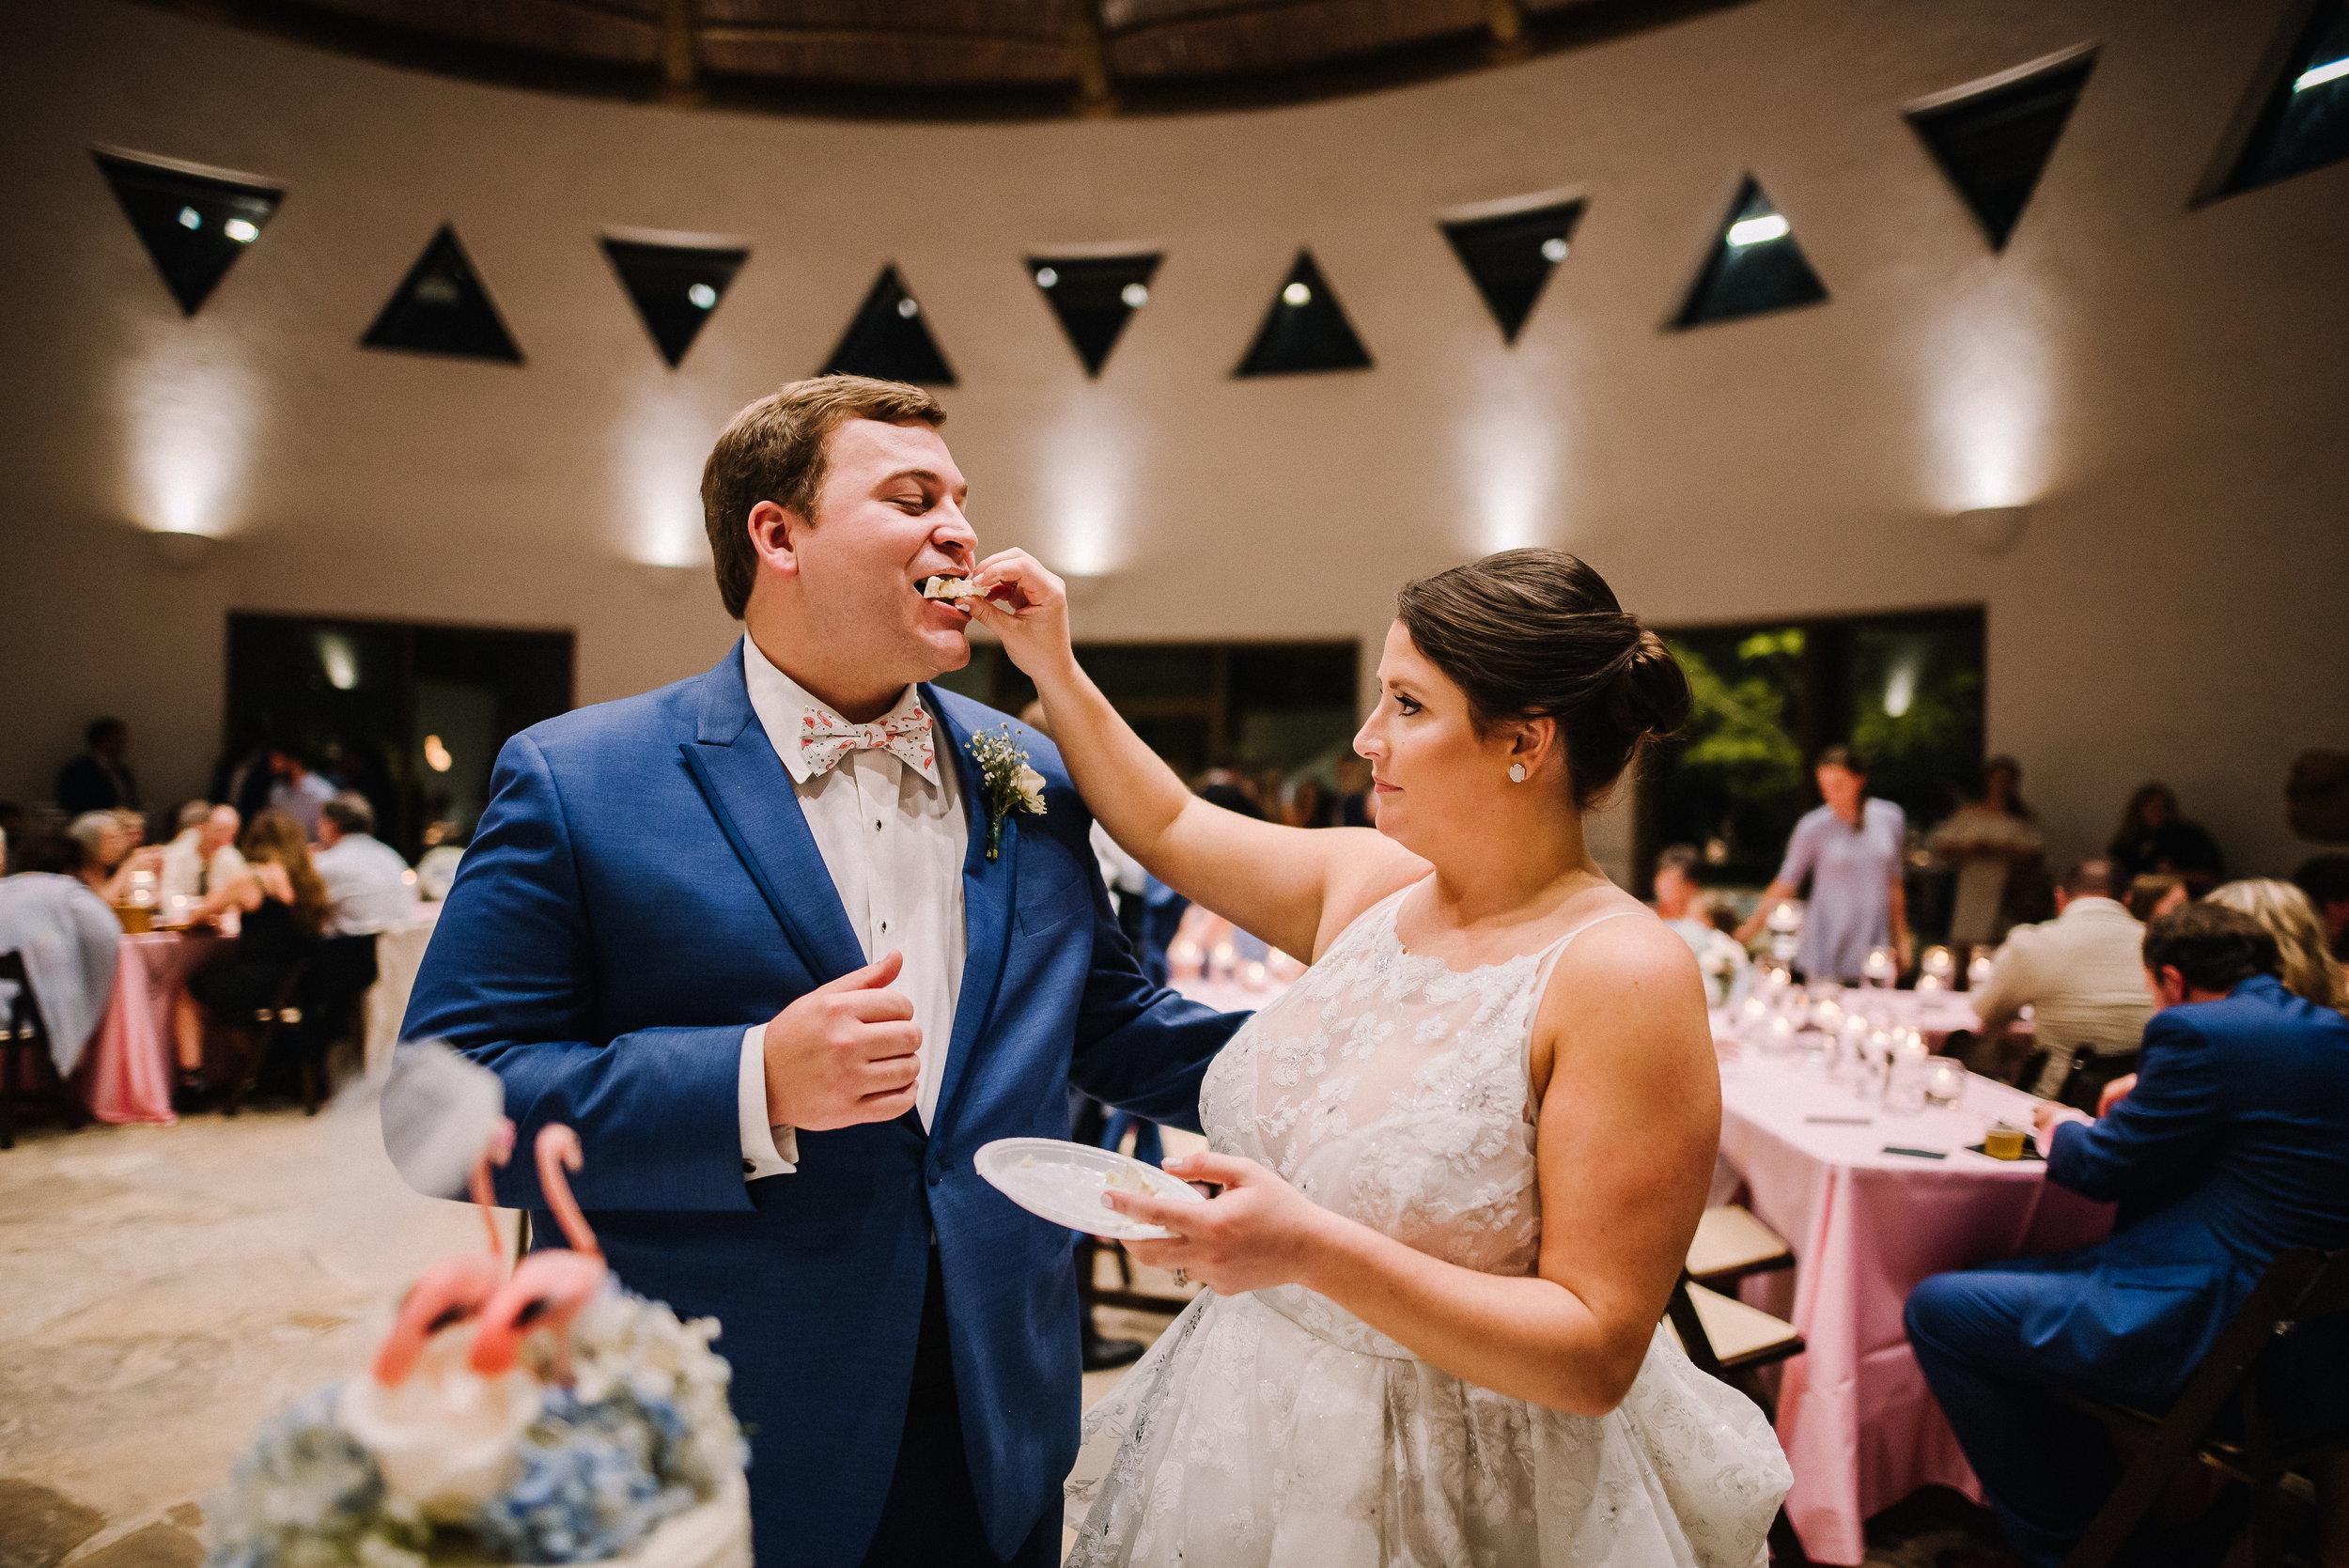 Smith Wedding_Memphis Zoo_Ashley Benham Photography-746.jpg